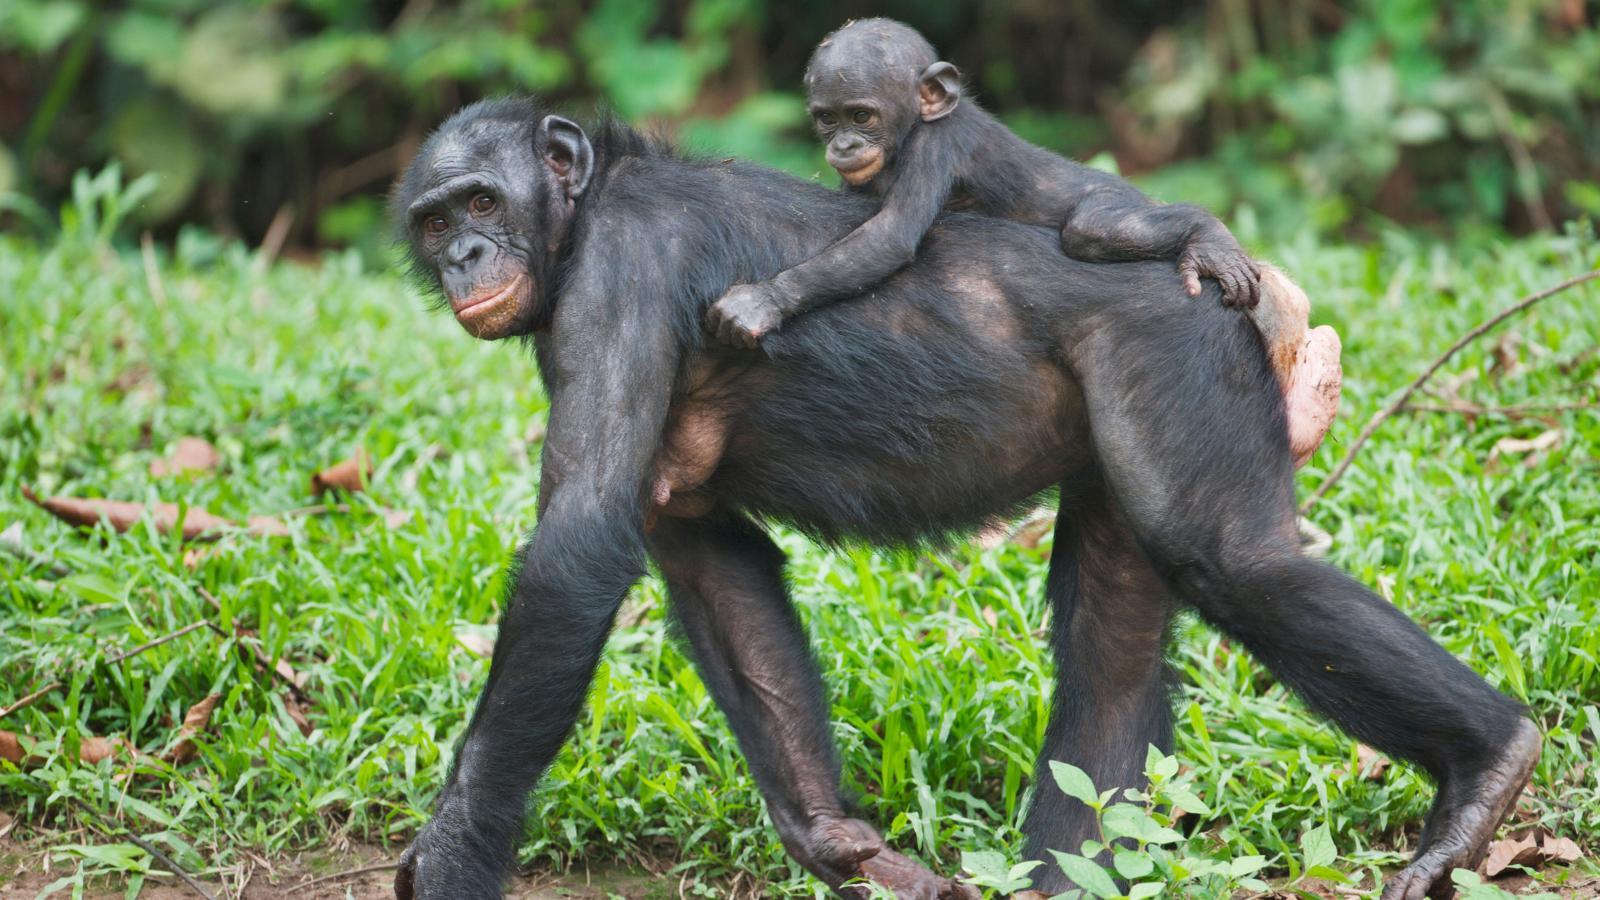 Mother and baby Bonobo Chimpanzee at the Sanctuary Lola Ya Bonobo, Democratic Republic of the Congo